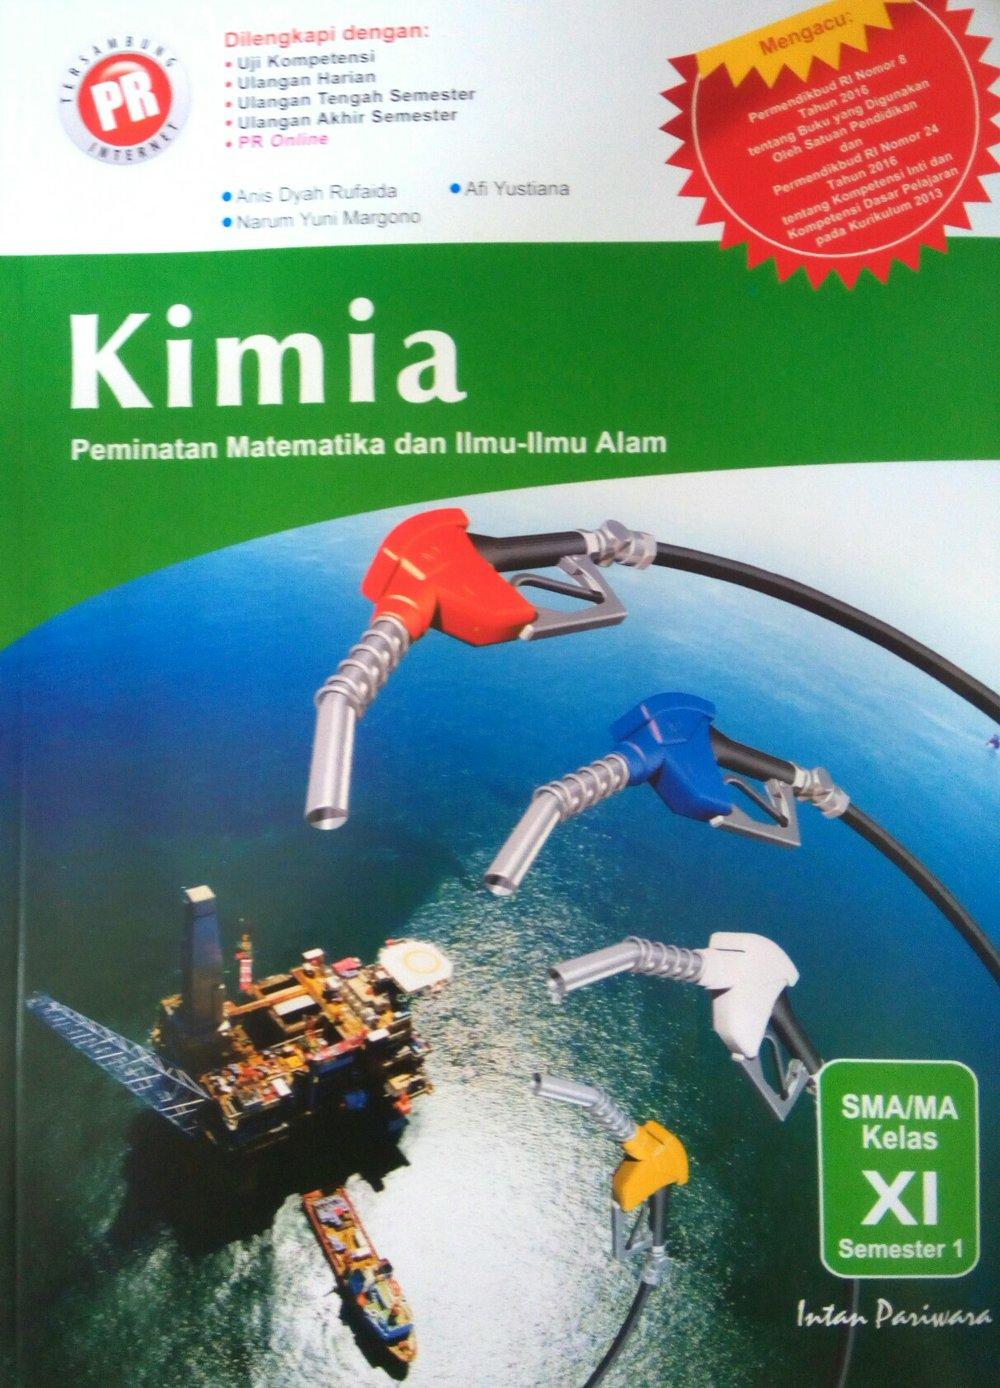 Buku Kimia Kelas Xi Intan Pariwara Fasrsg